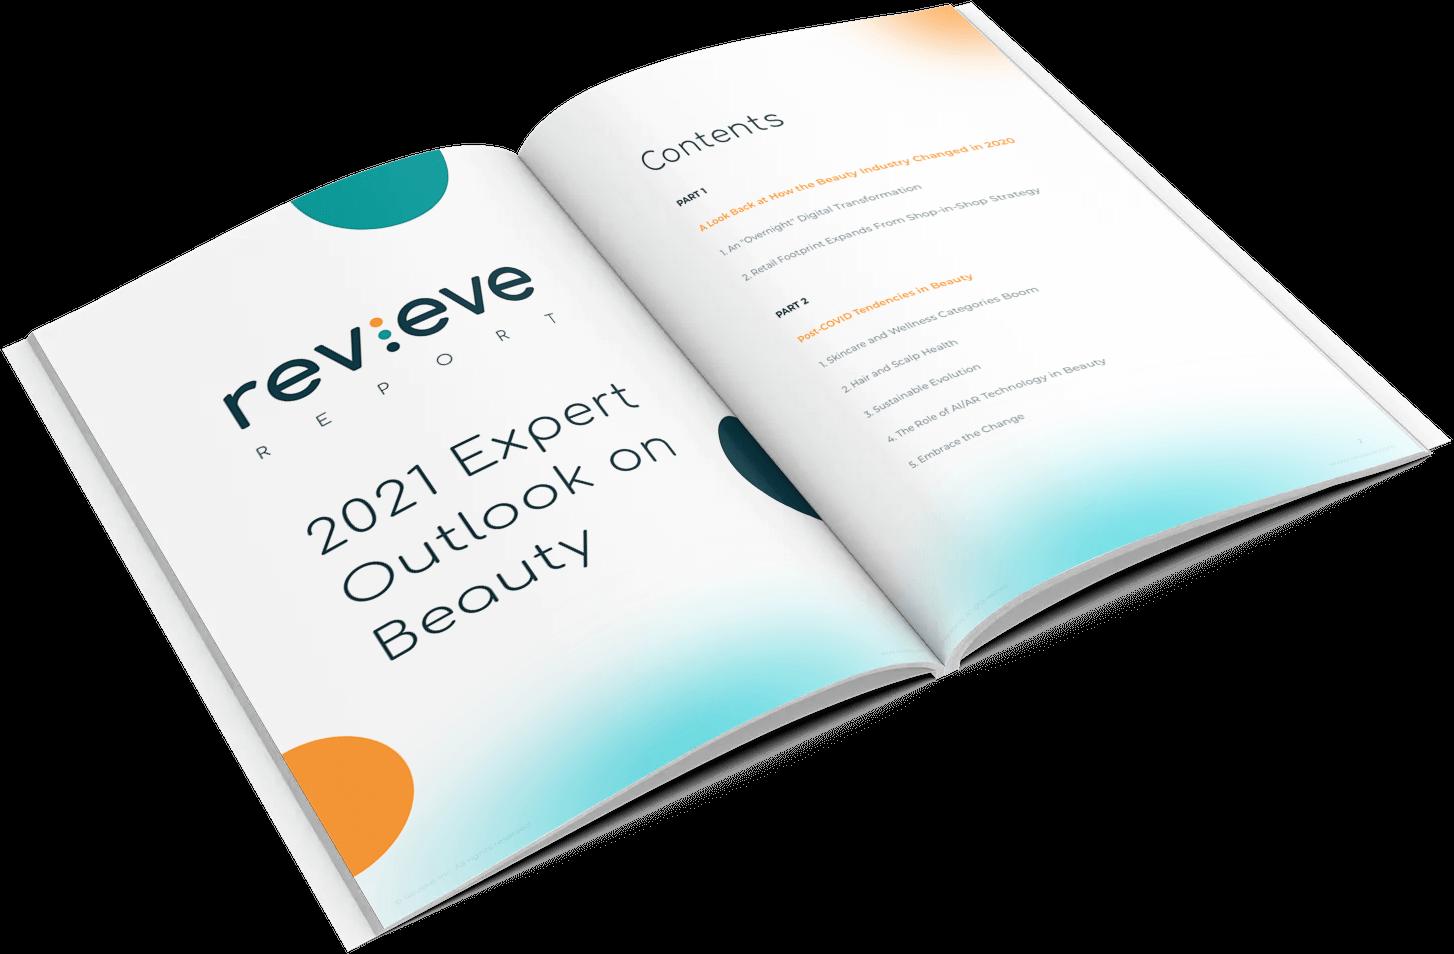 2021 Expert Outlook on Beauty